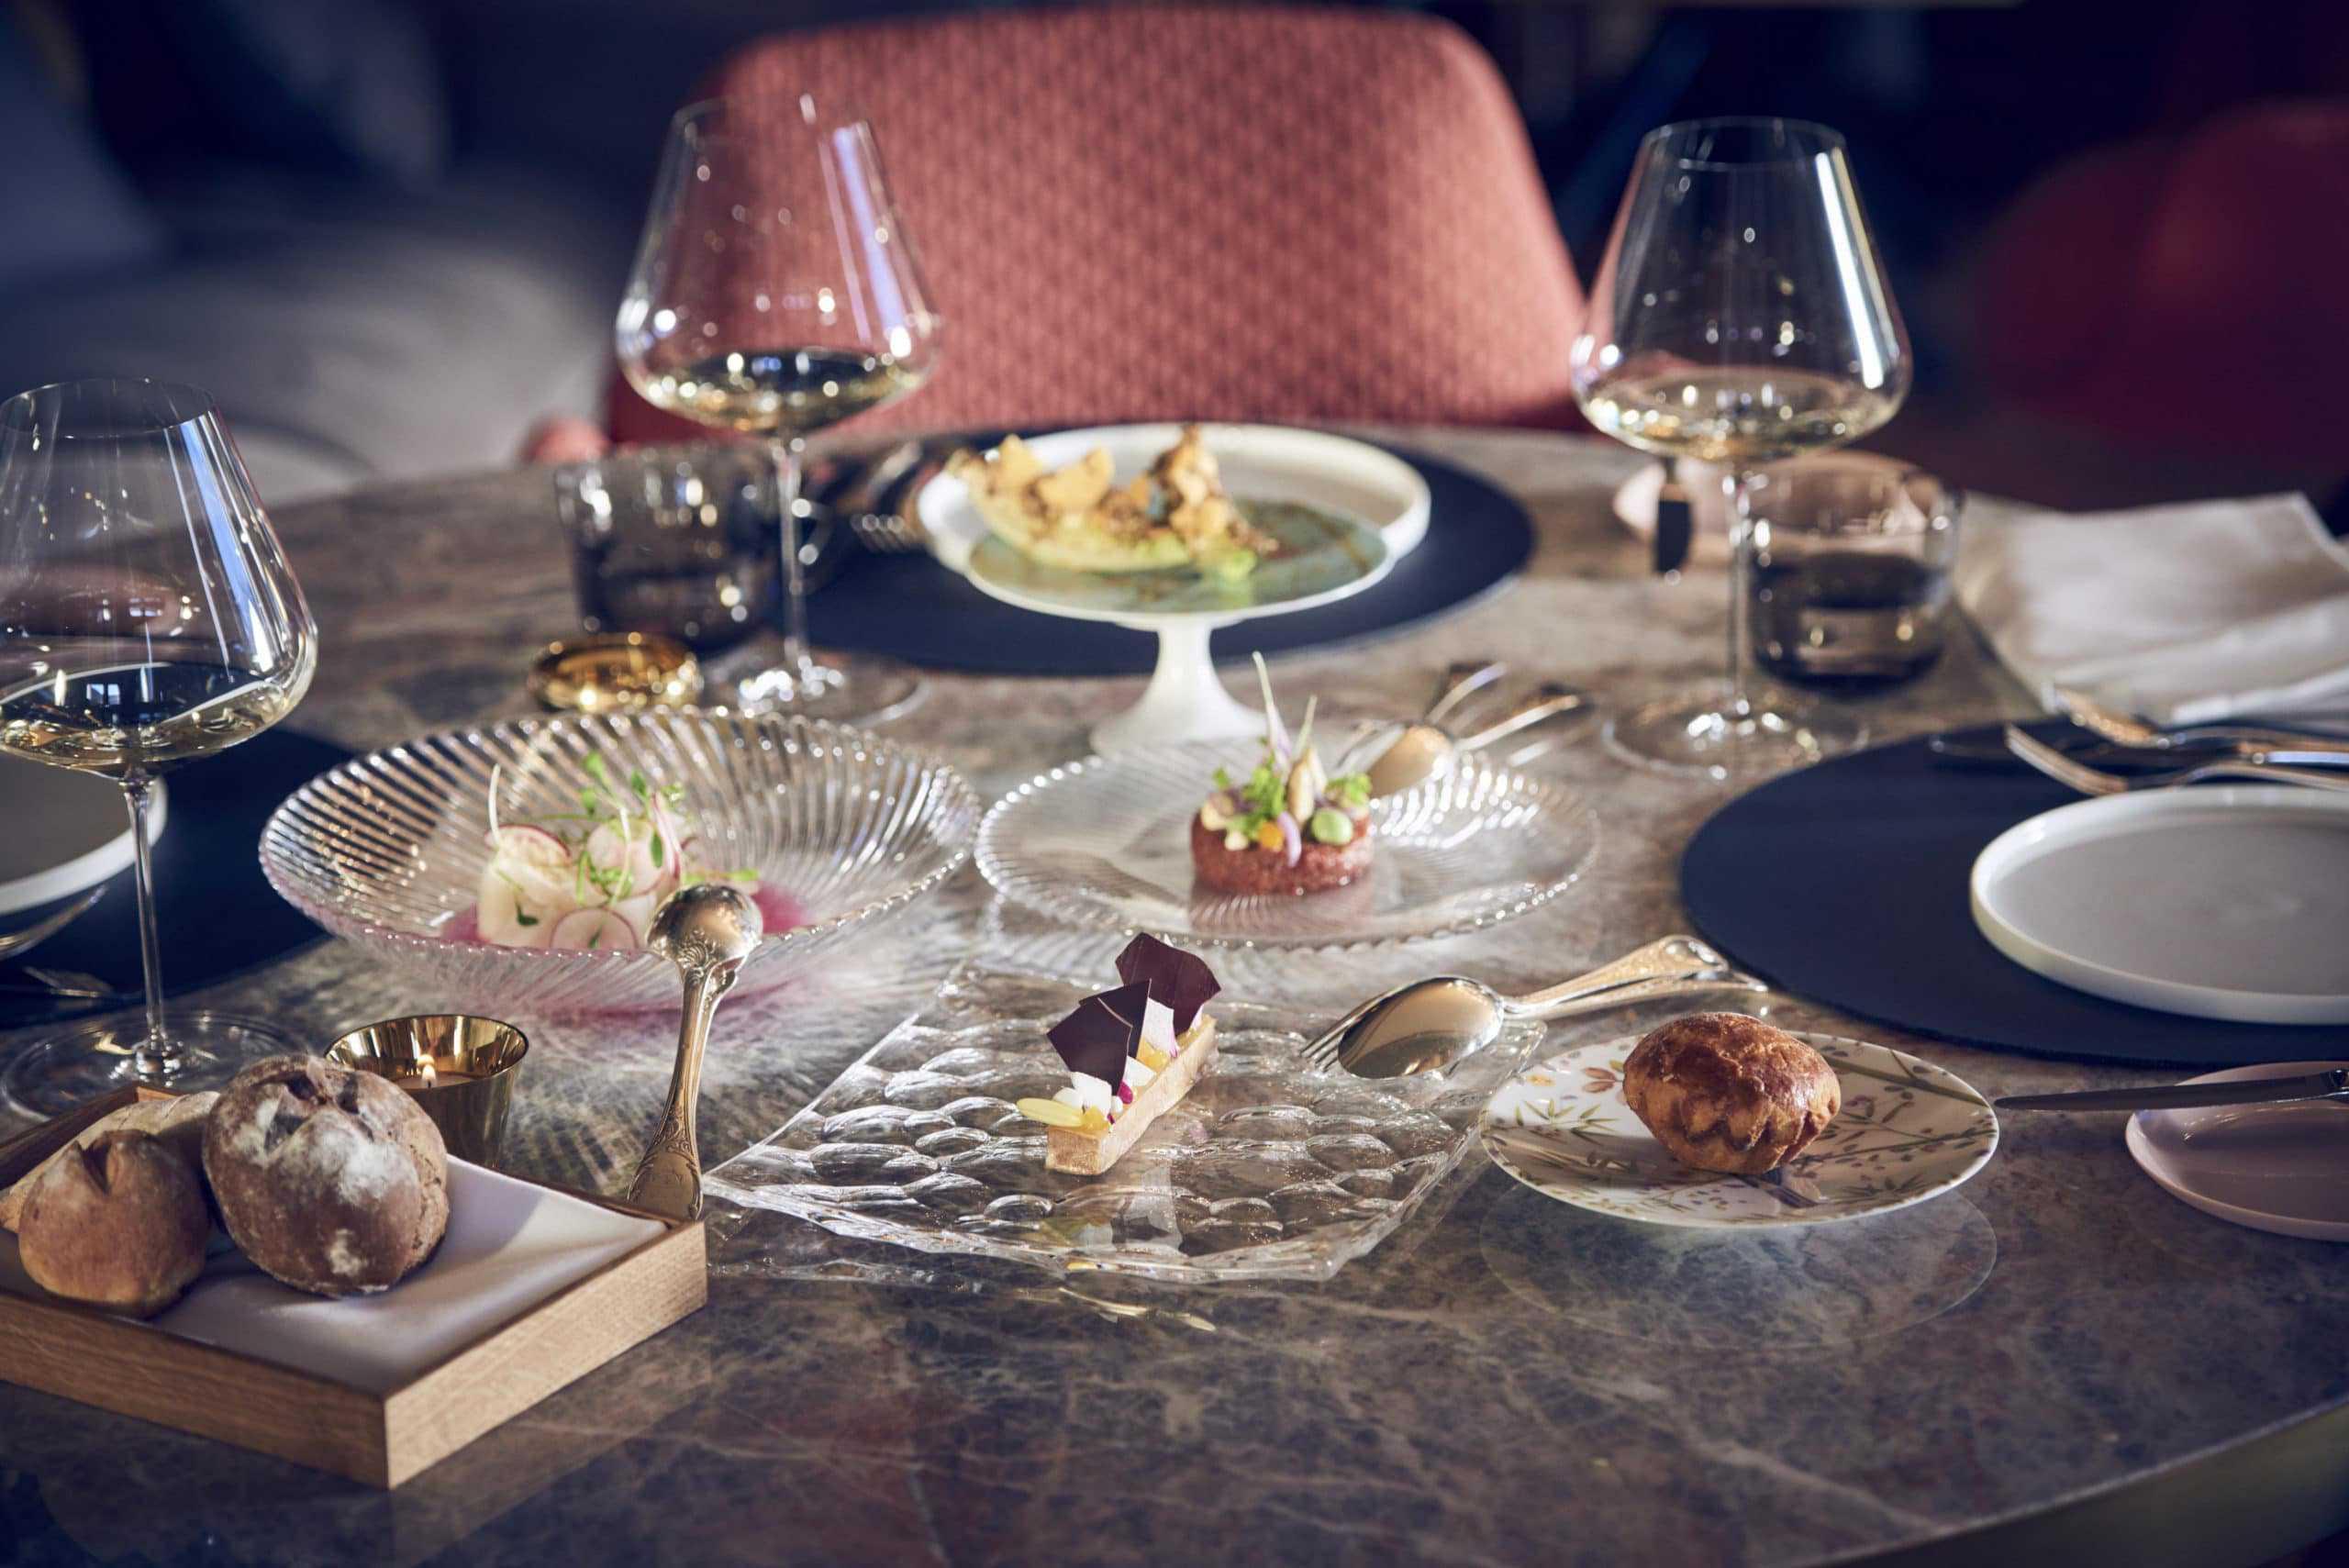 Badrutts-Palace-Hotel-IGNIV-Restaurant-Sharing-dishes-scaled-1